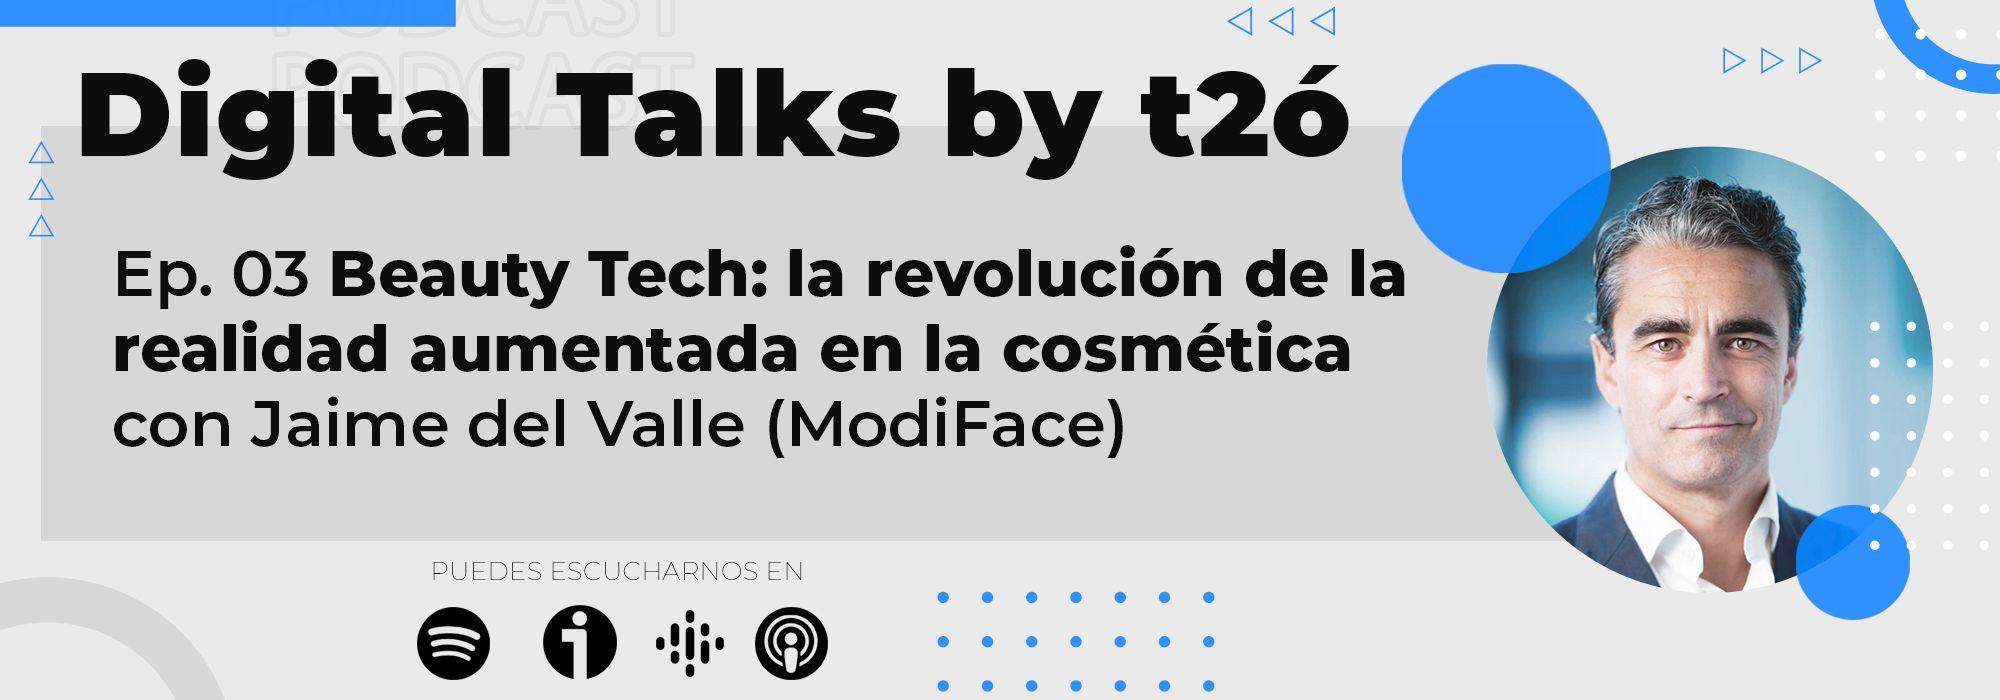 Episodio 3 Realidad Aumentada Podcast Digital Talks by t2ó